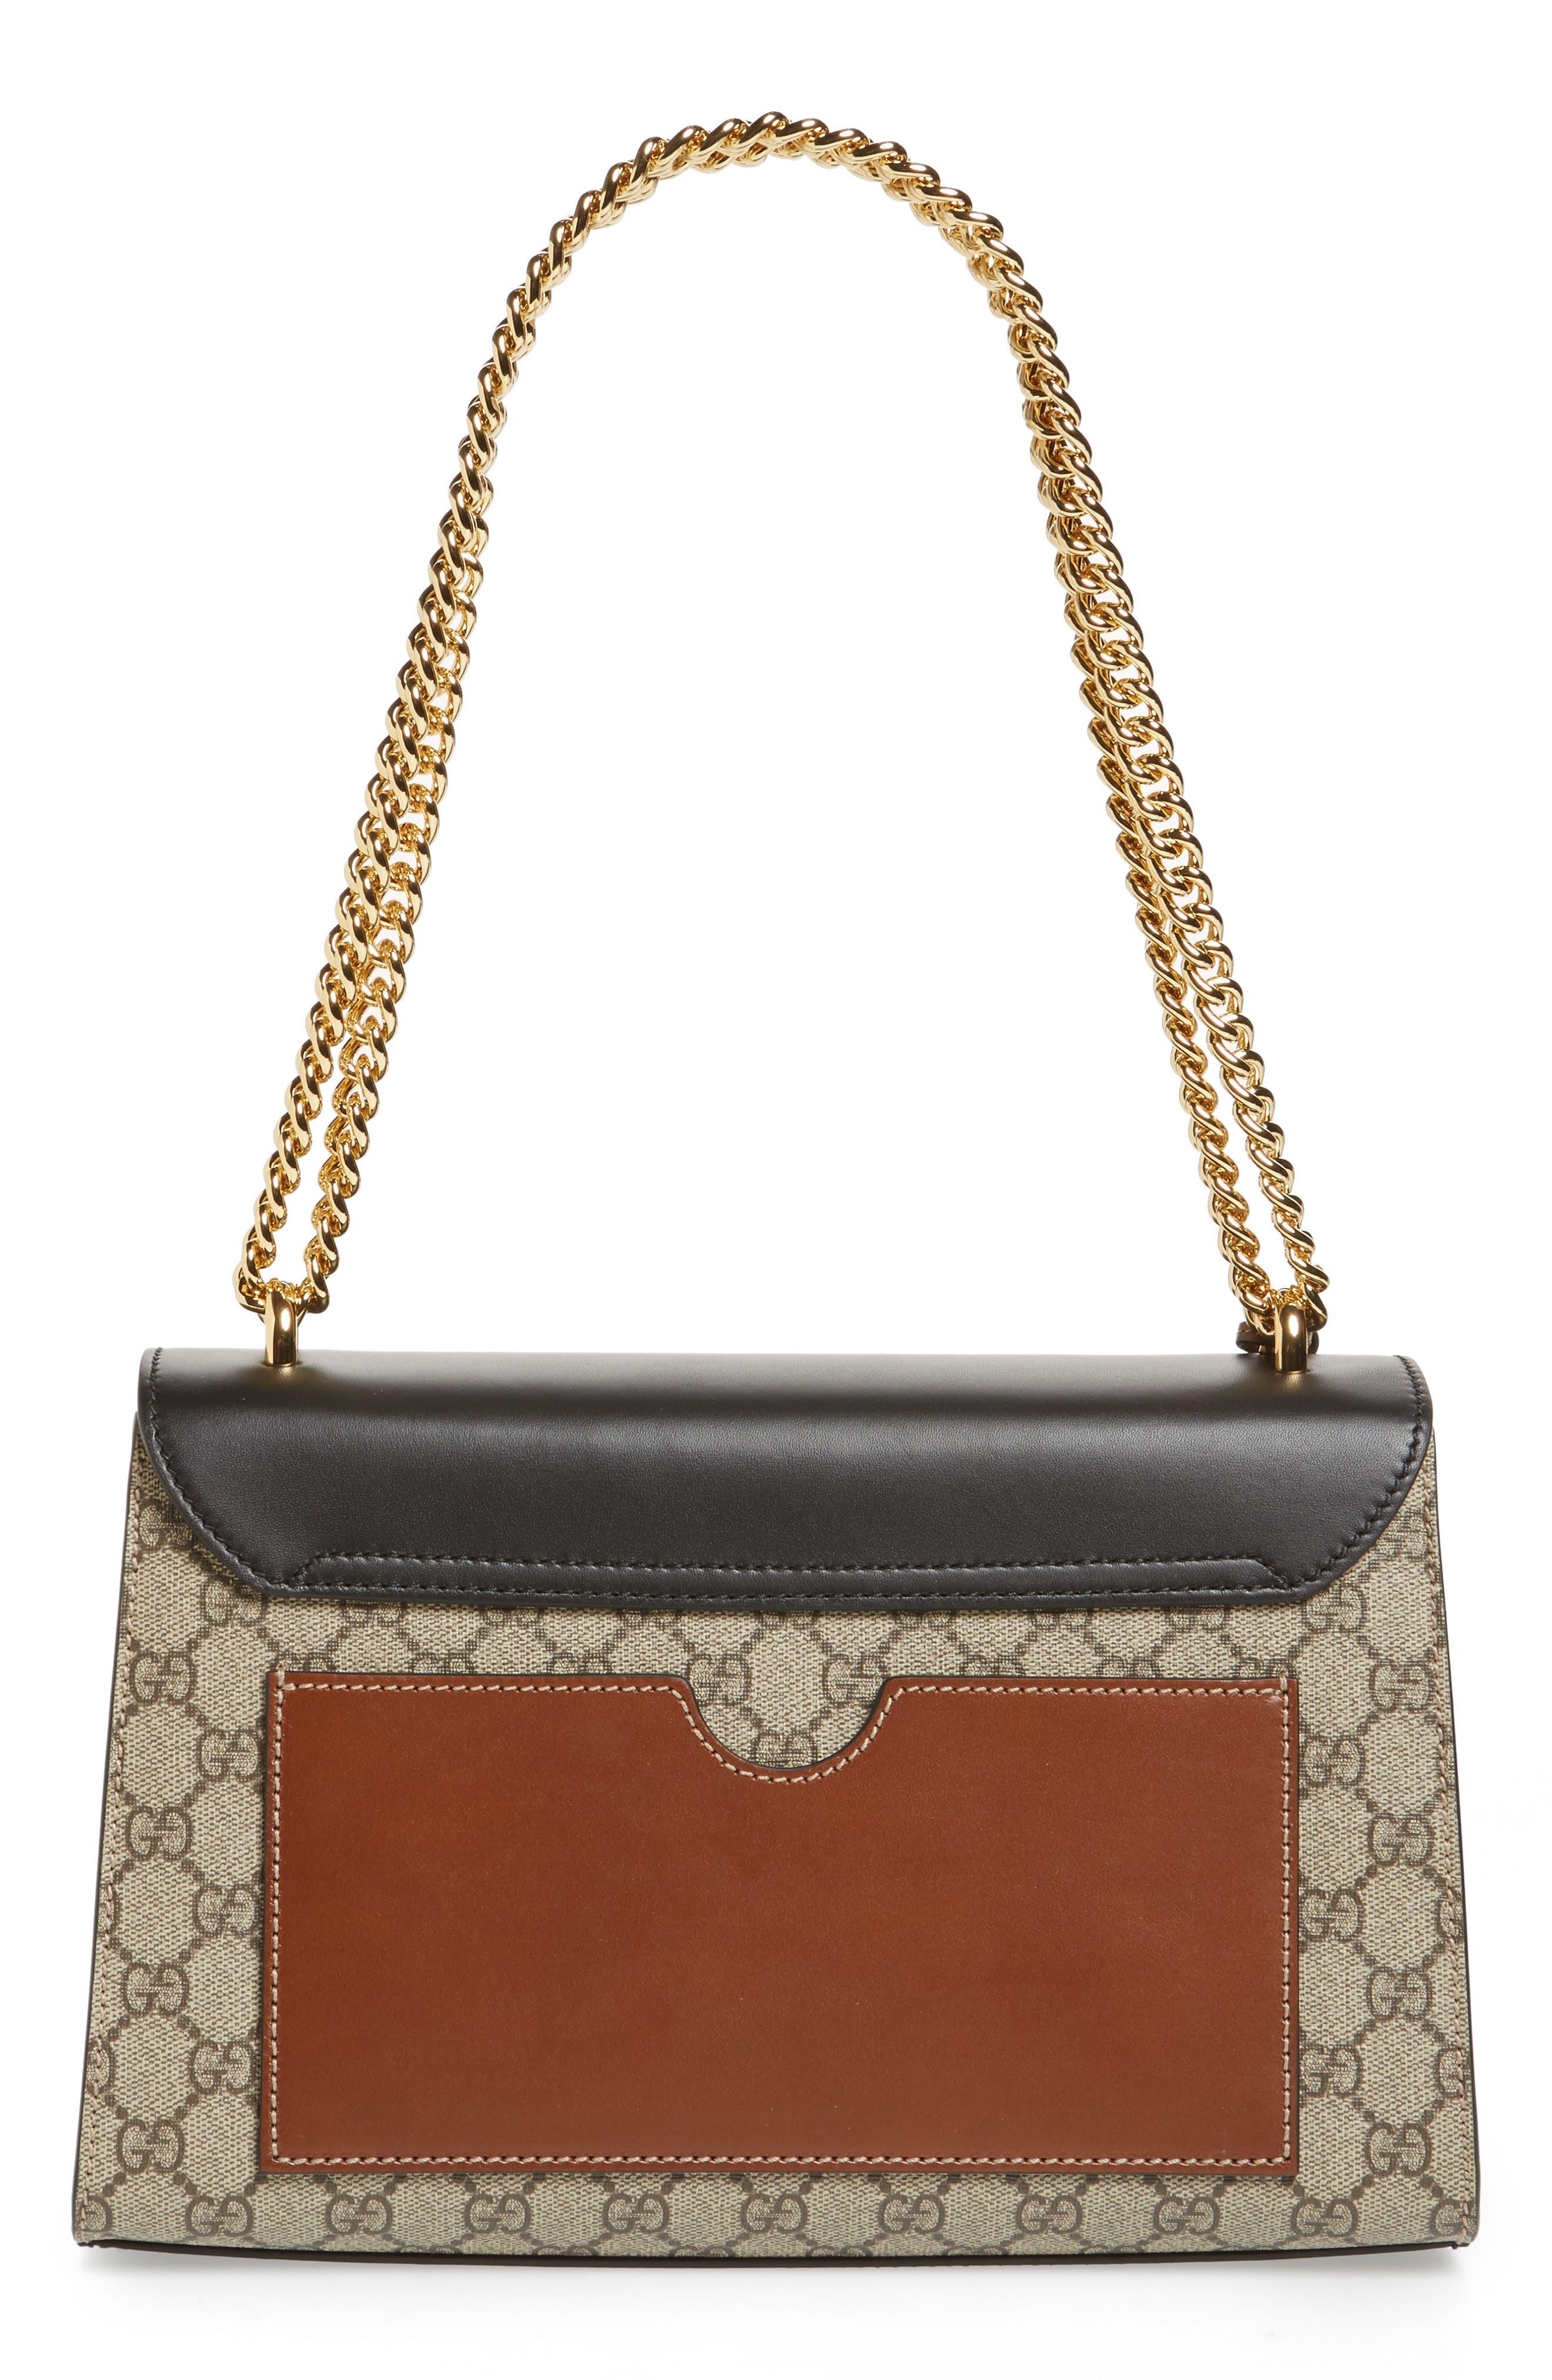 Medium Padlock Leather Shoulder Bag,                             Alternate thumbnail 3, color,                             MOON/ TOSCANO